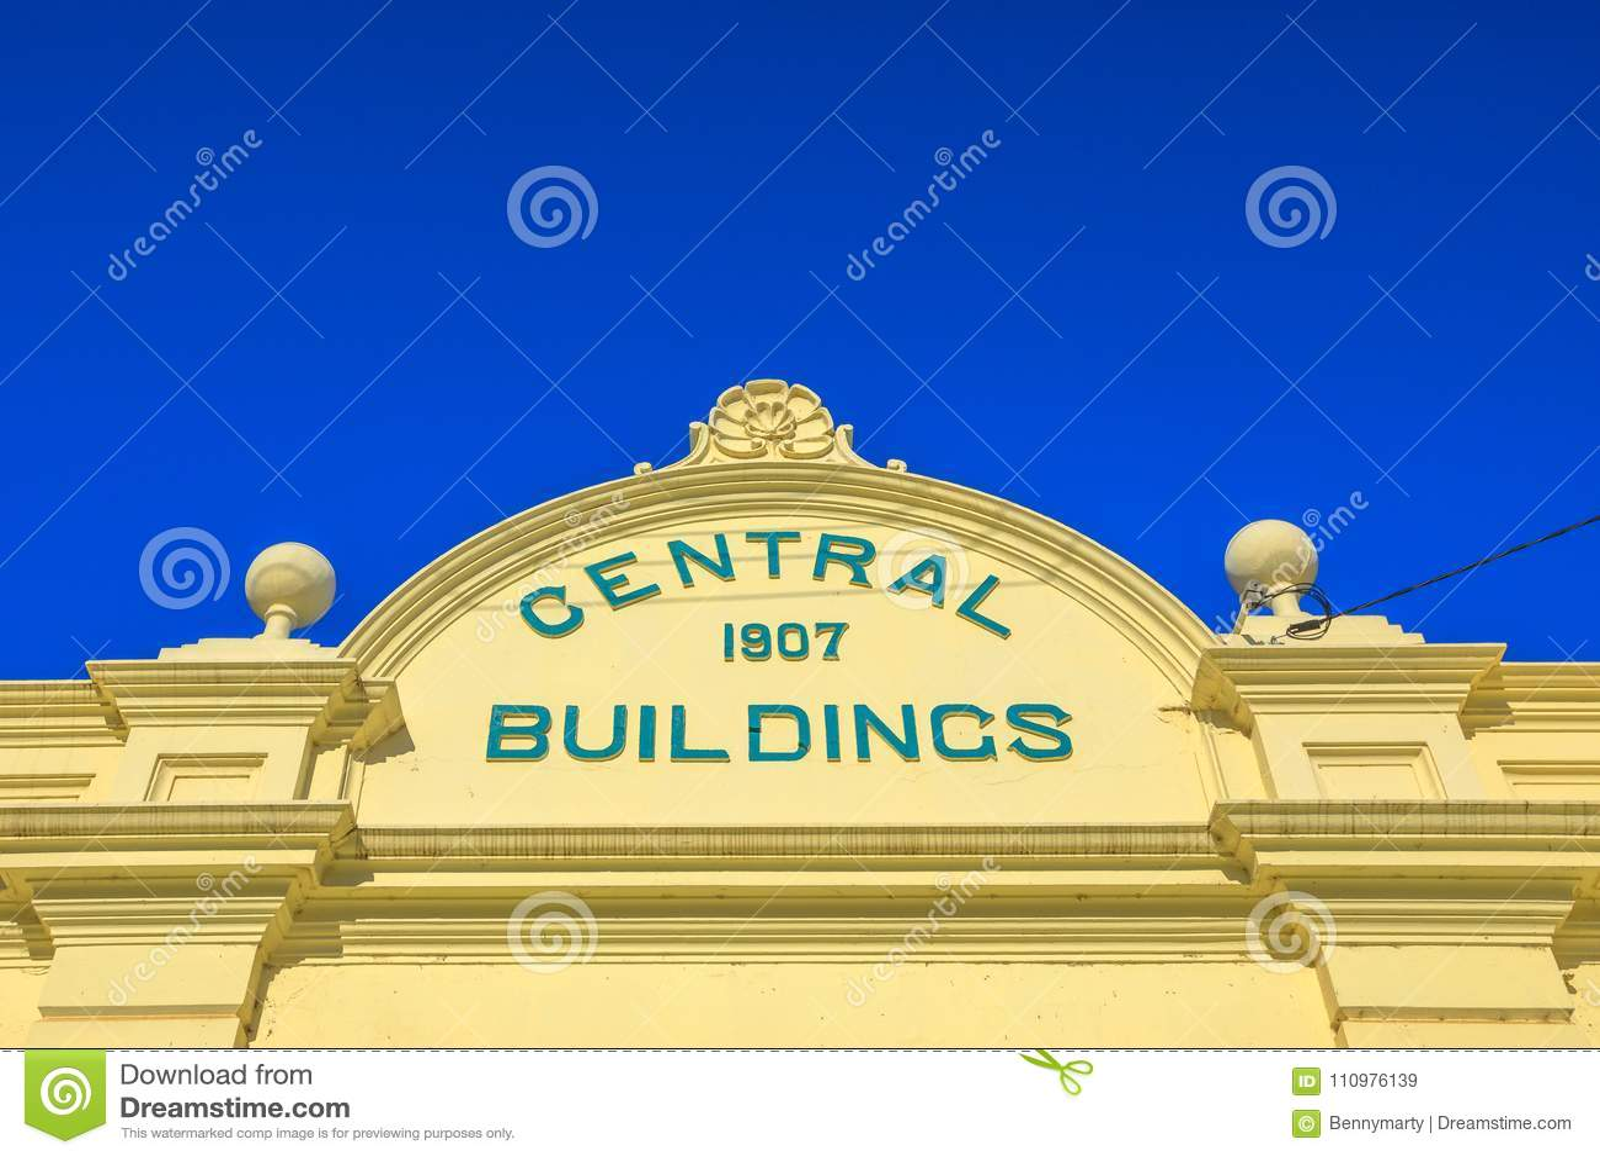 Central Buildings York Stock Image Image Of Town Landmark